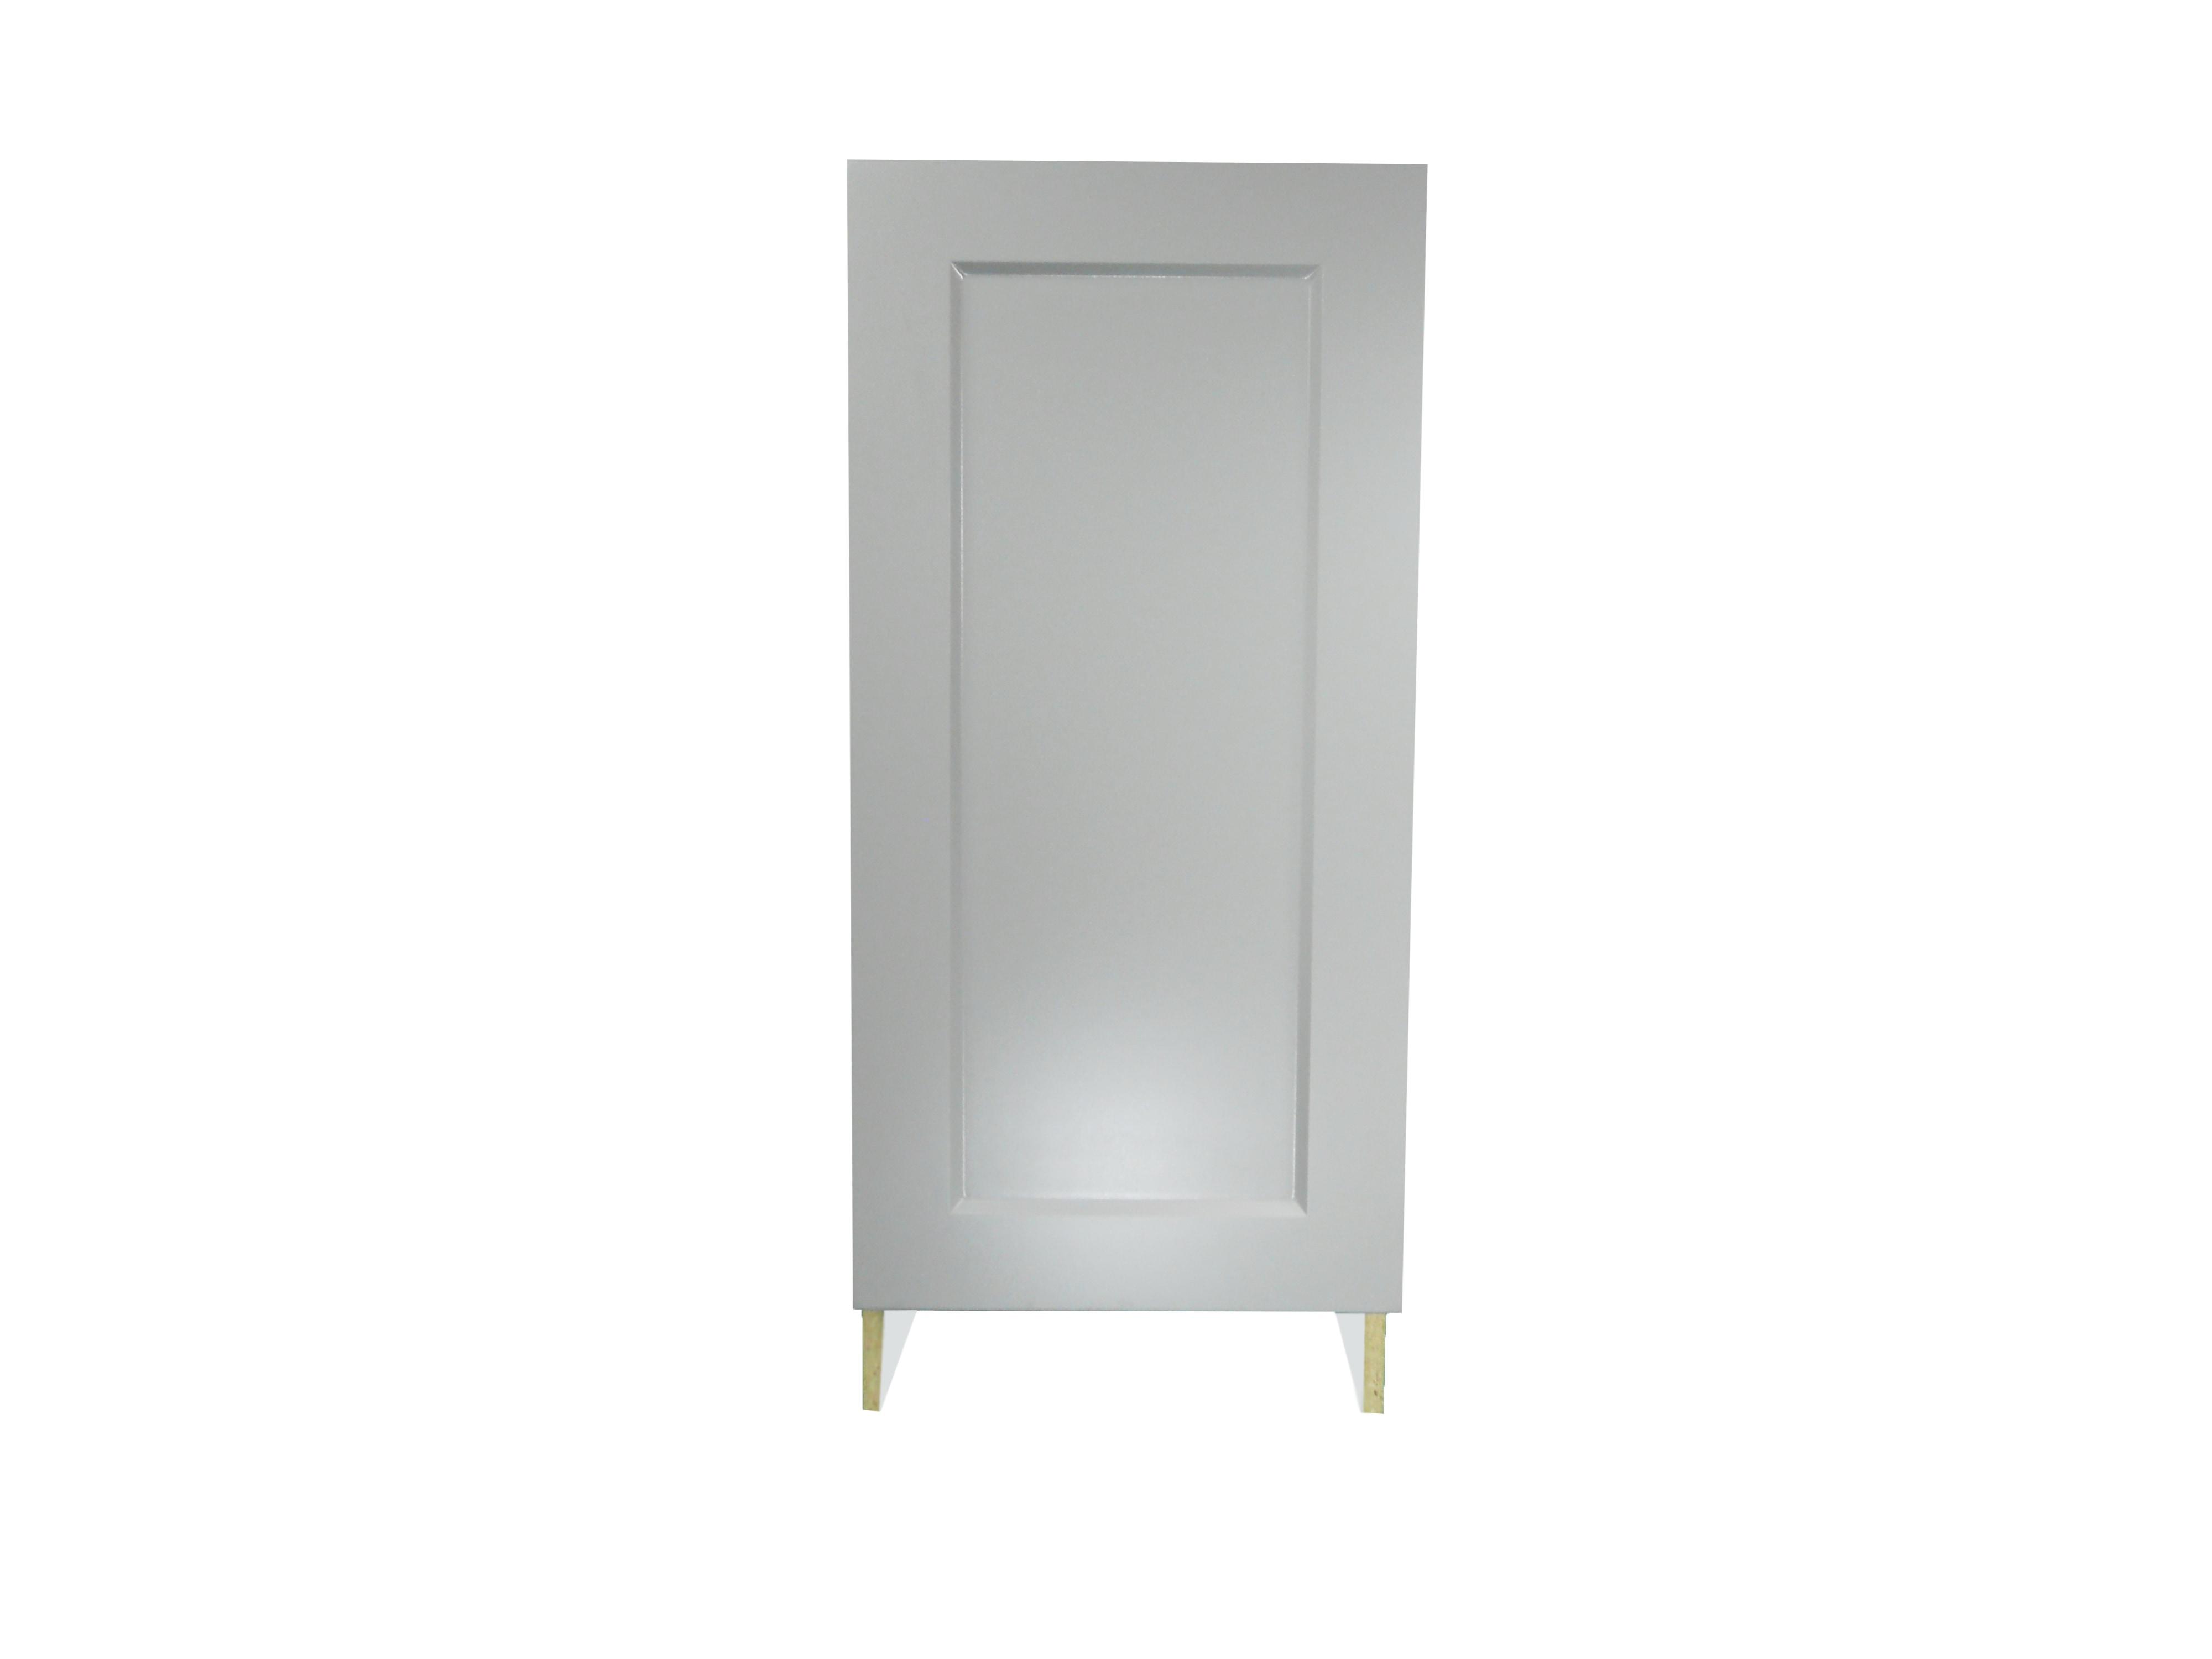 Base Cabinet With Door / Whistler Grey / Flat Panel Grey / 15 Whistler Grey 0